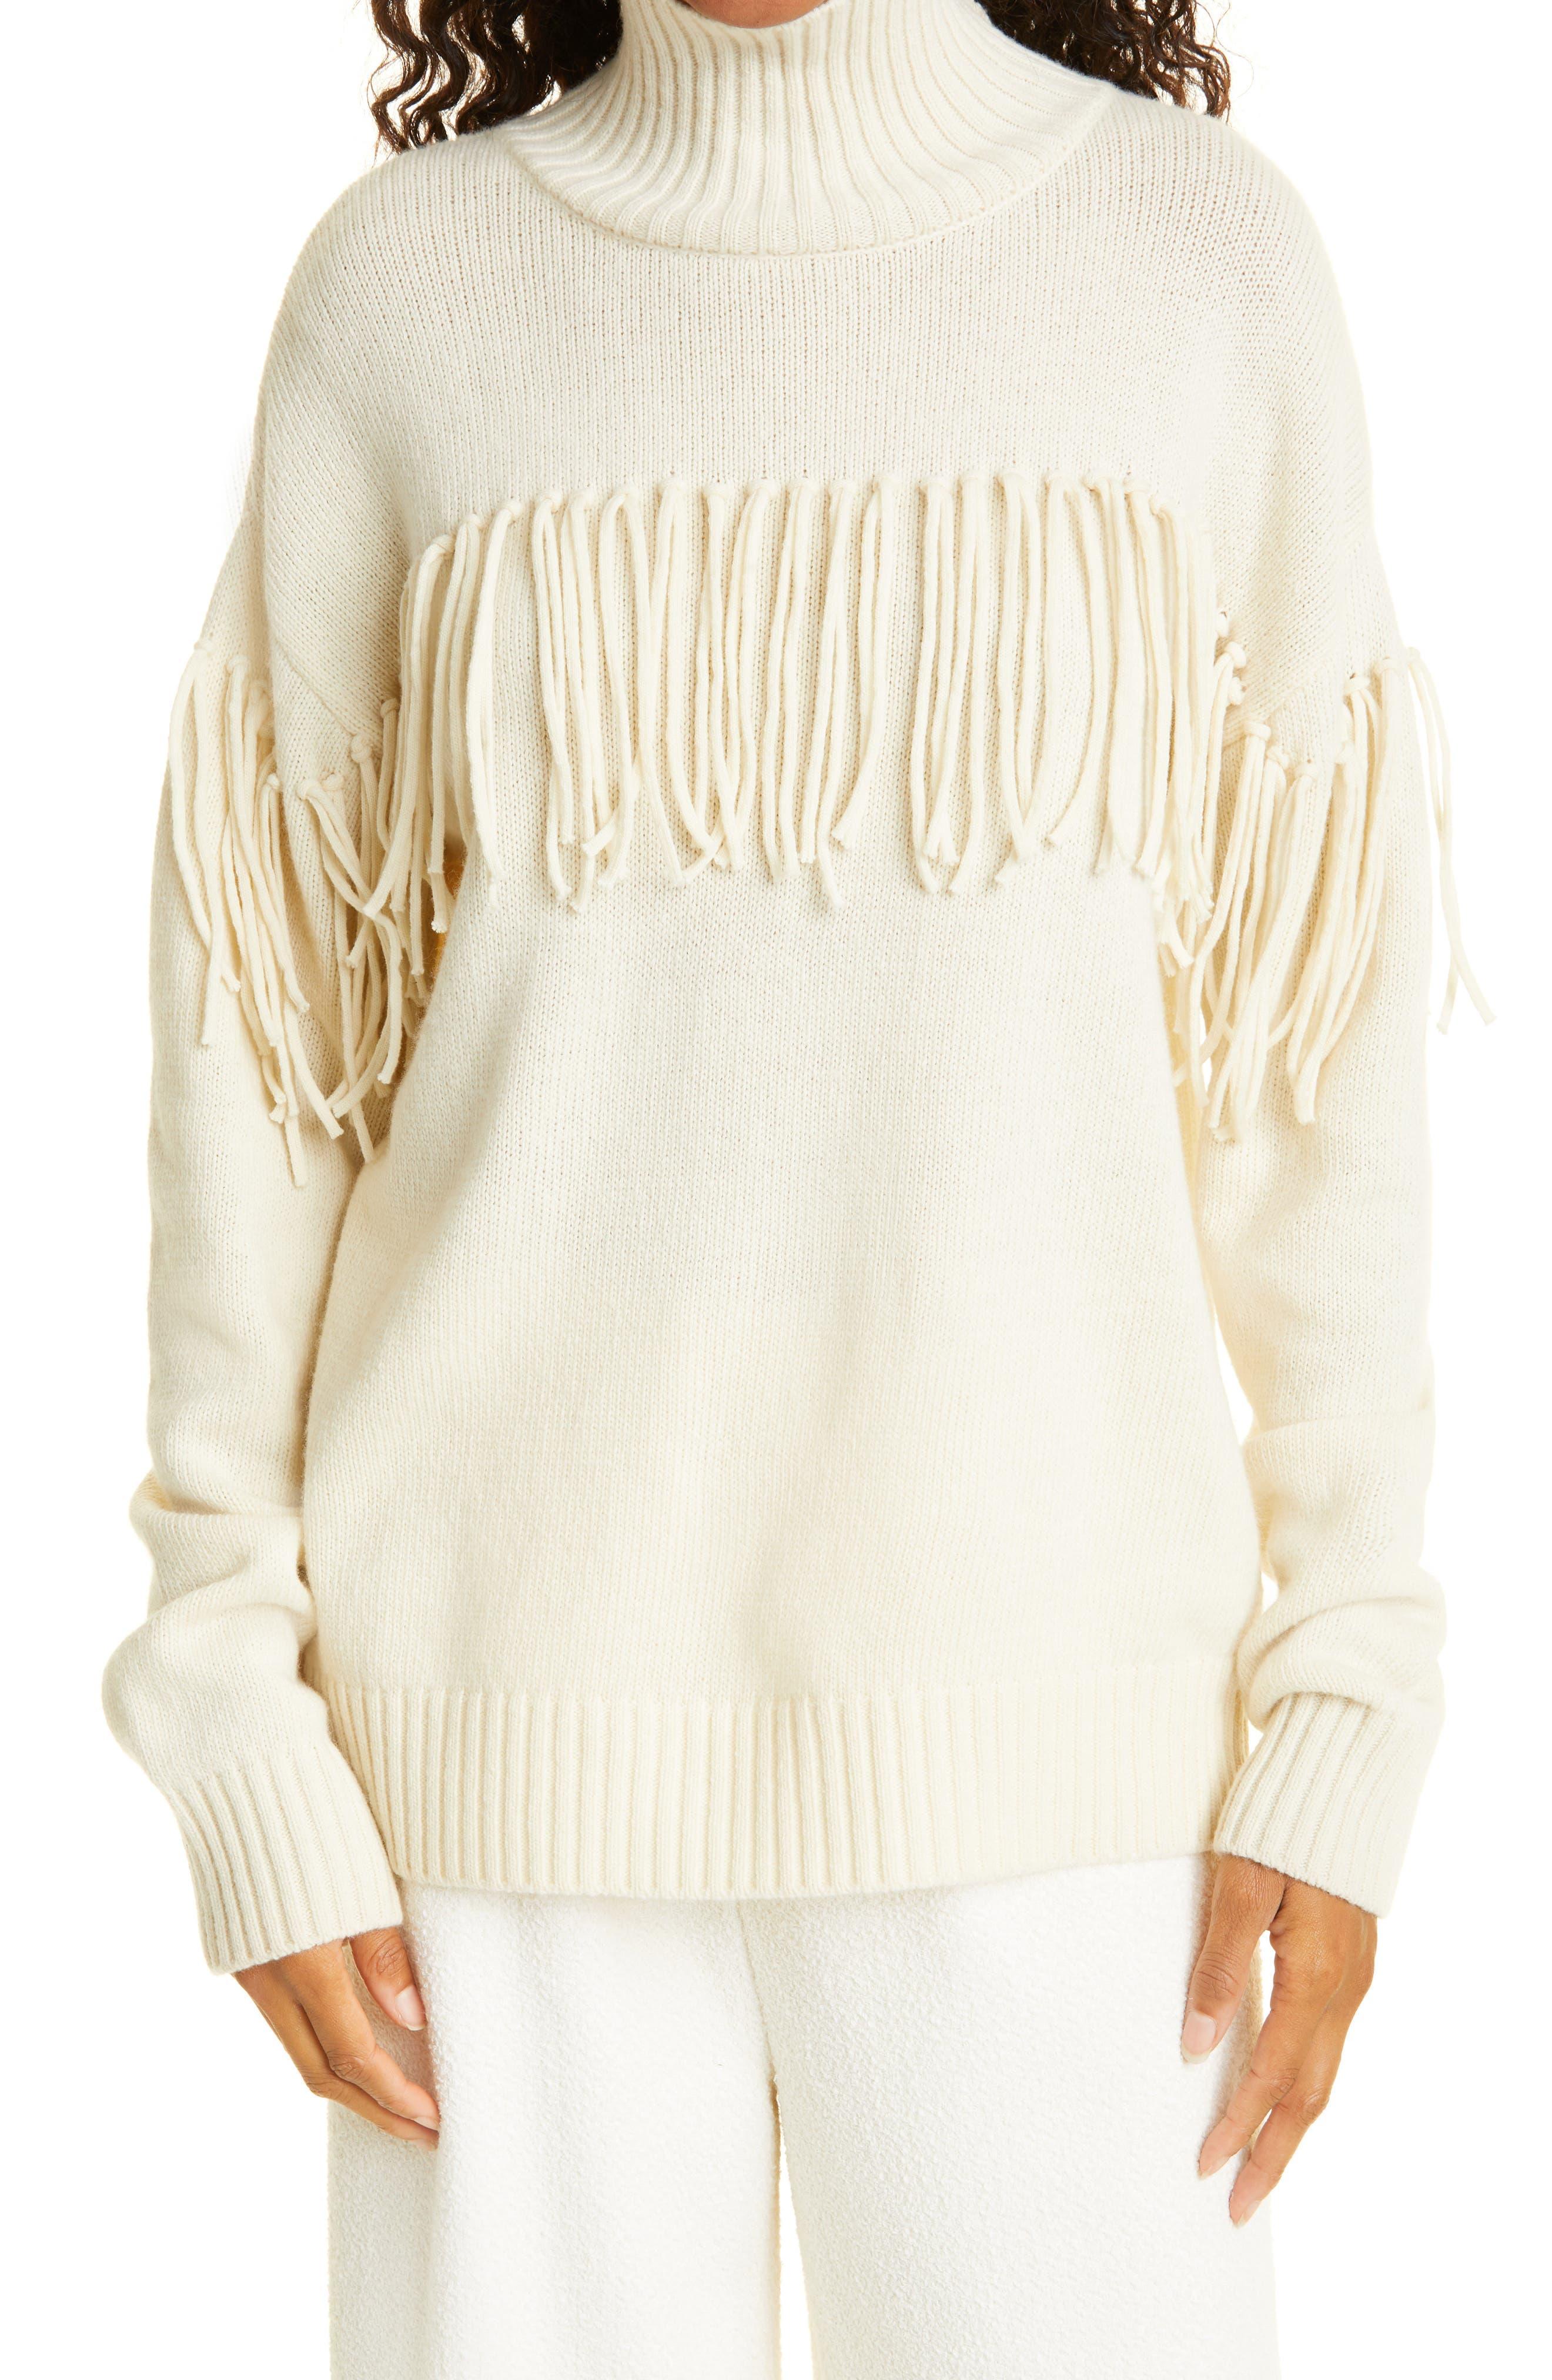 Women's Jason Wu Fringe Merino Wool Sweater